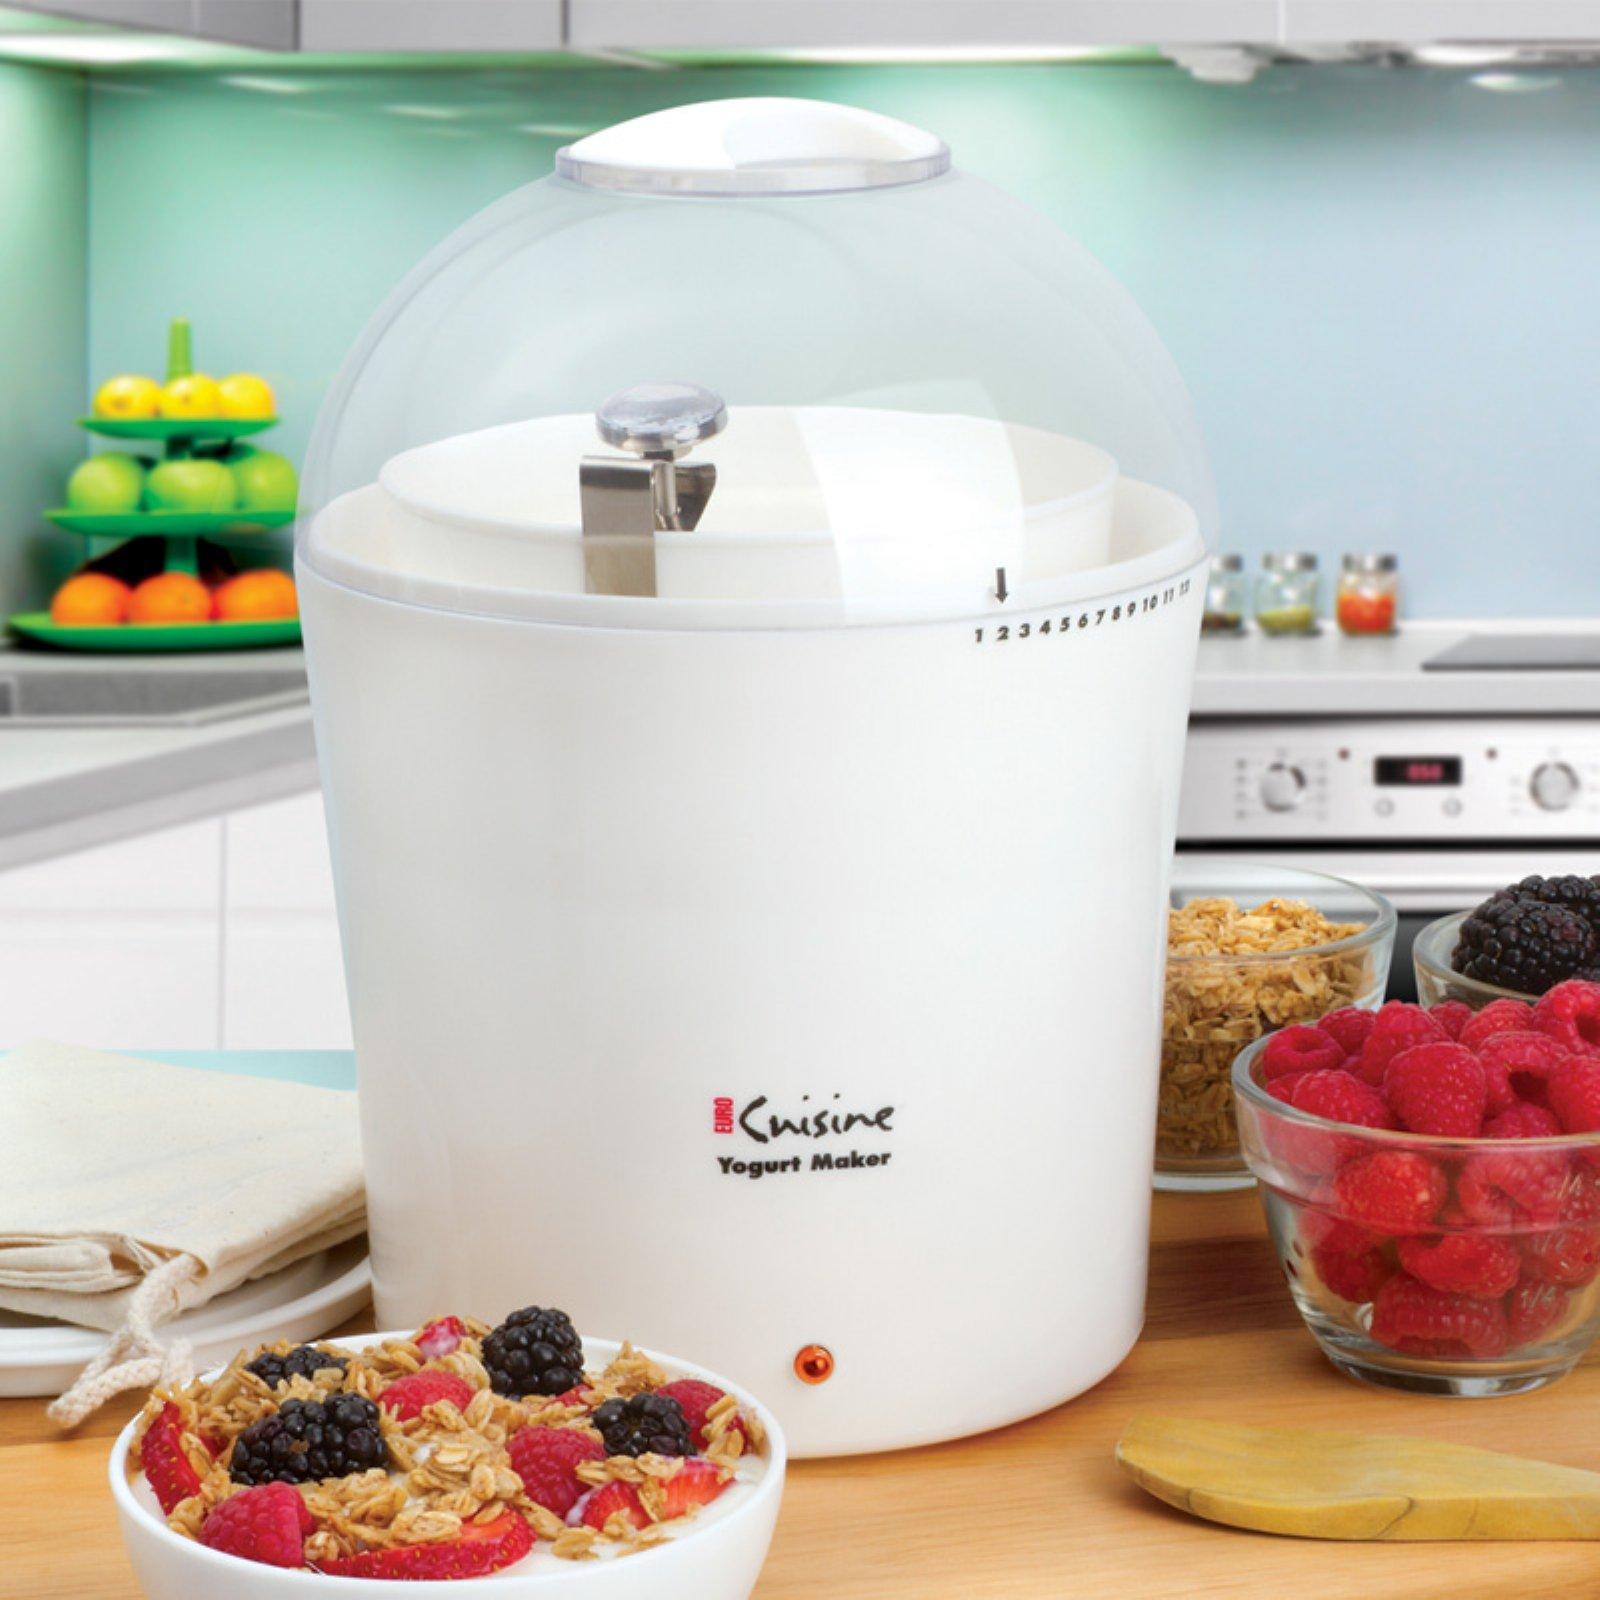 Euro Cuisine YM260 Yogurt Maker